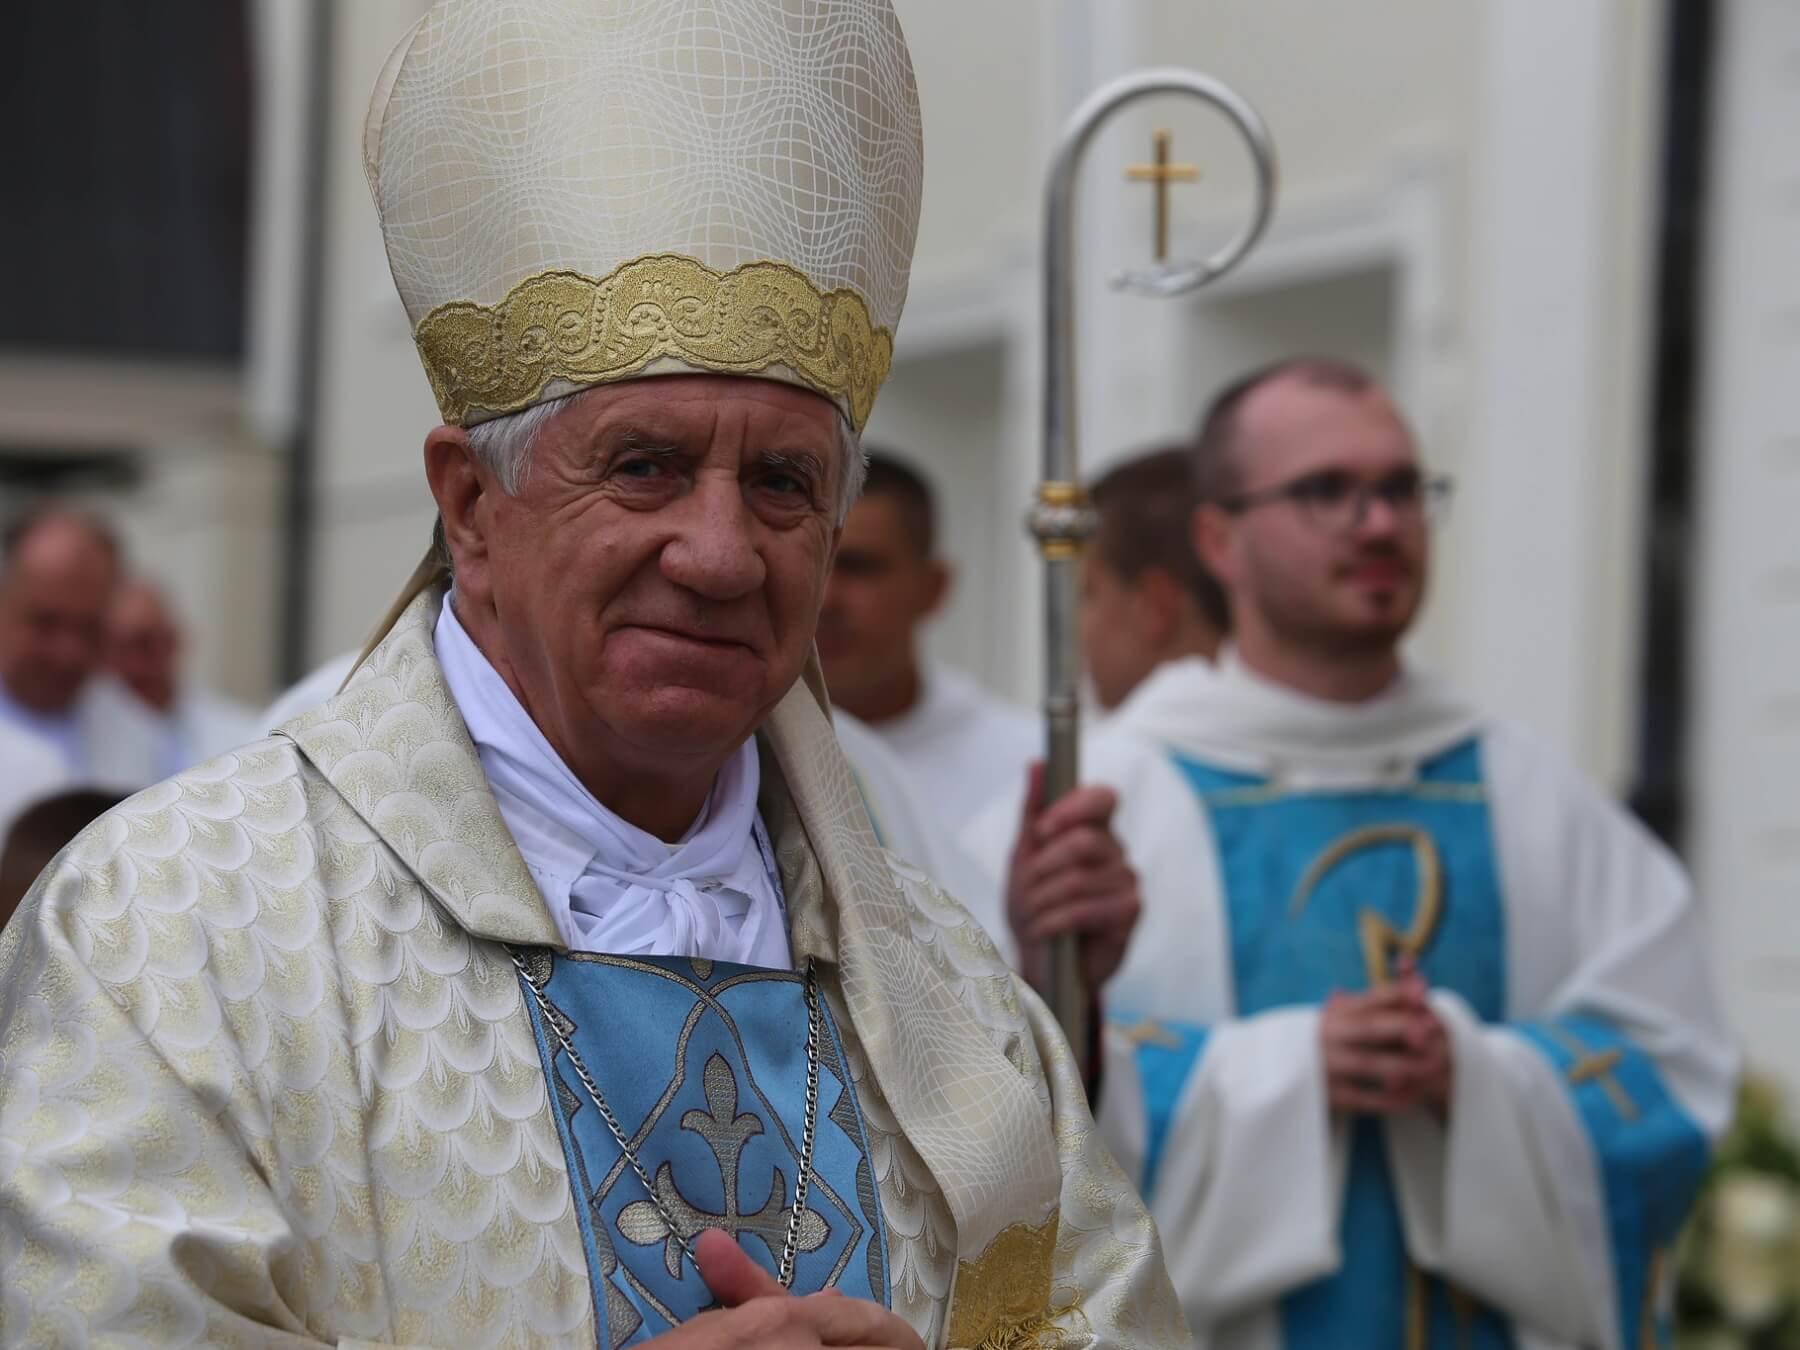 Abp Andrzej Dzięga